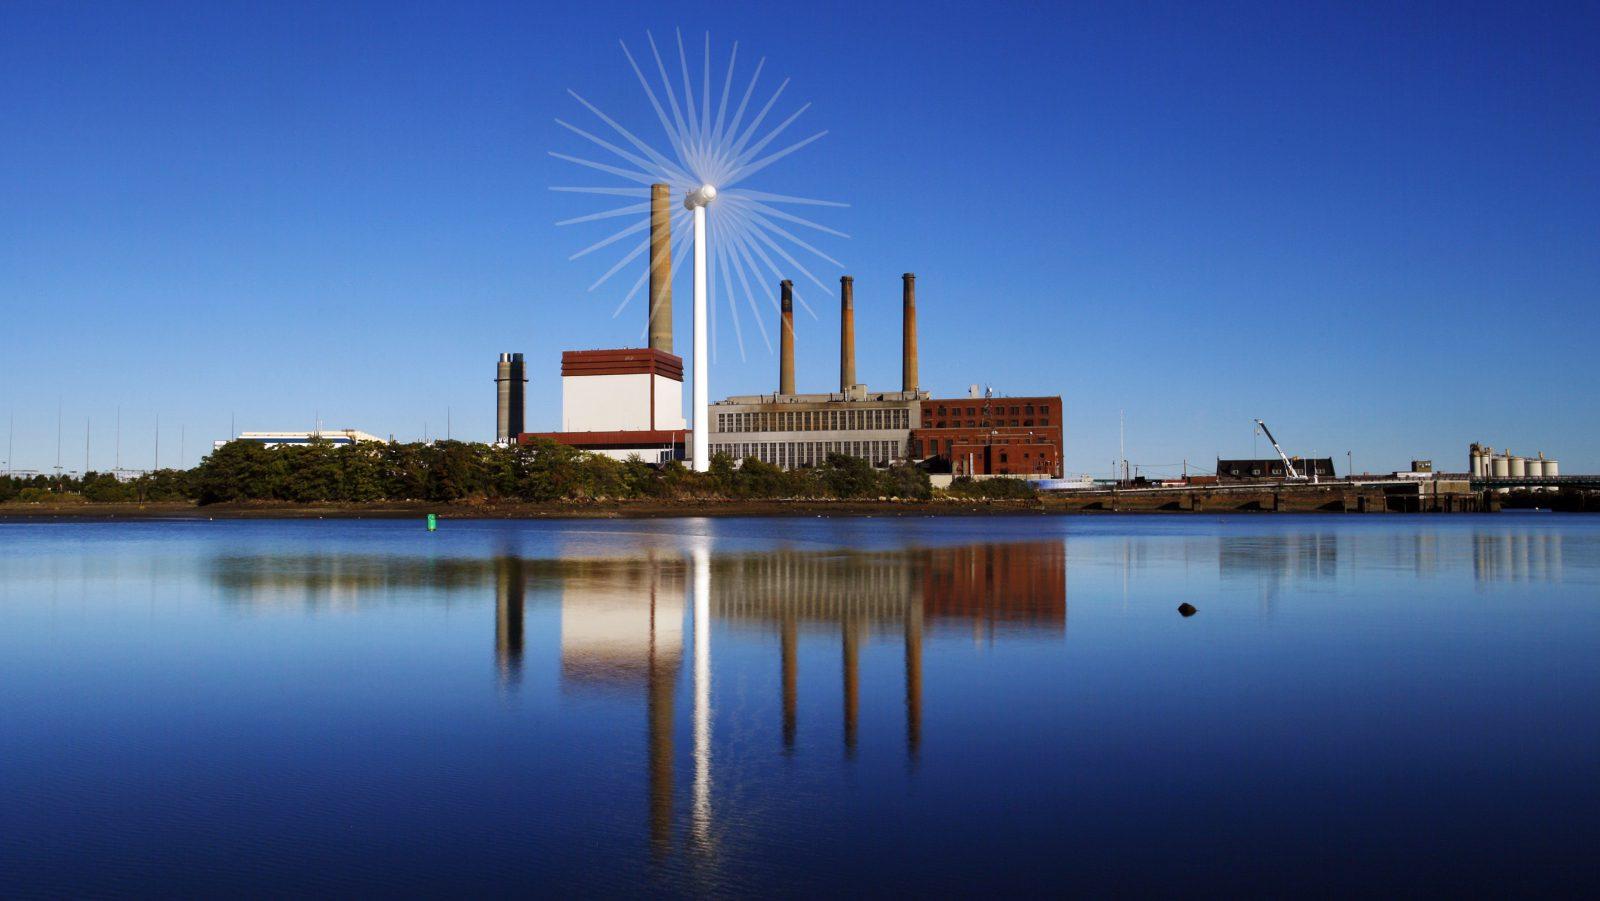 Massachusetts wind turbine and fossil plant.